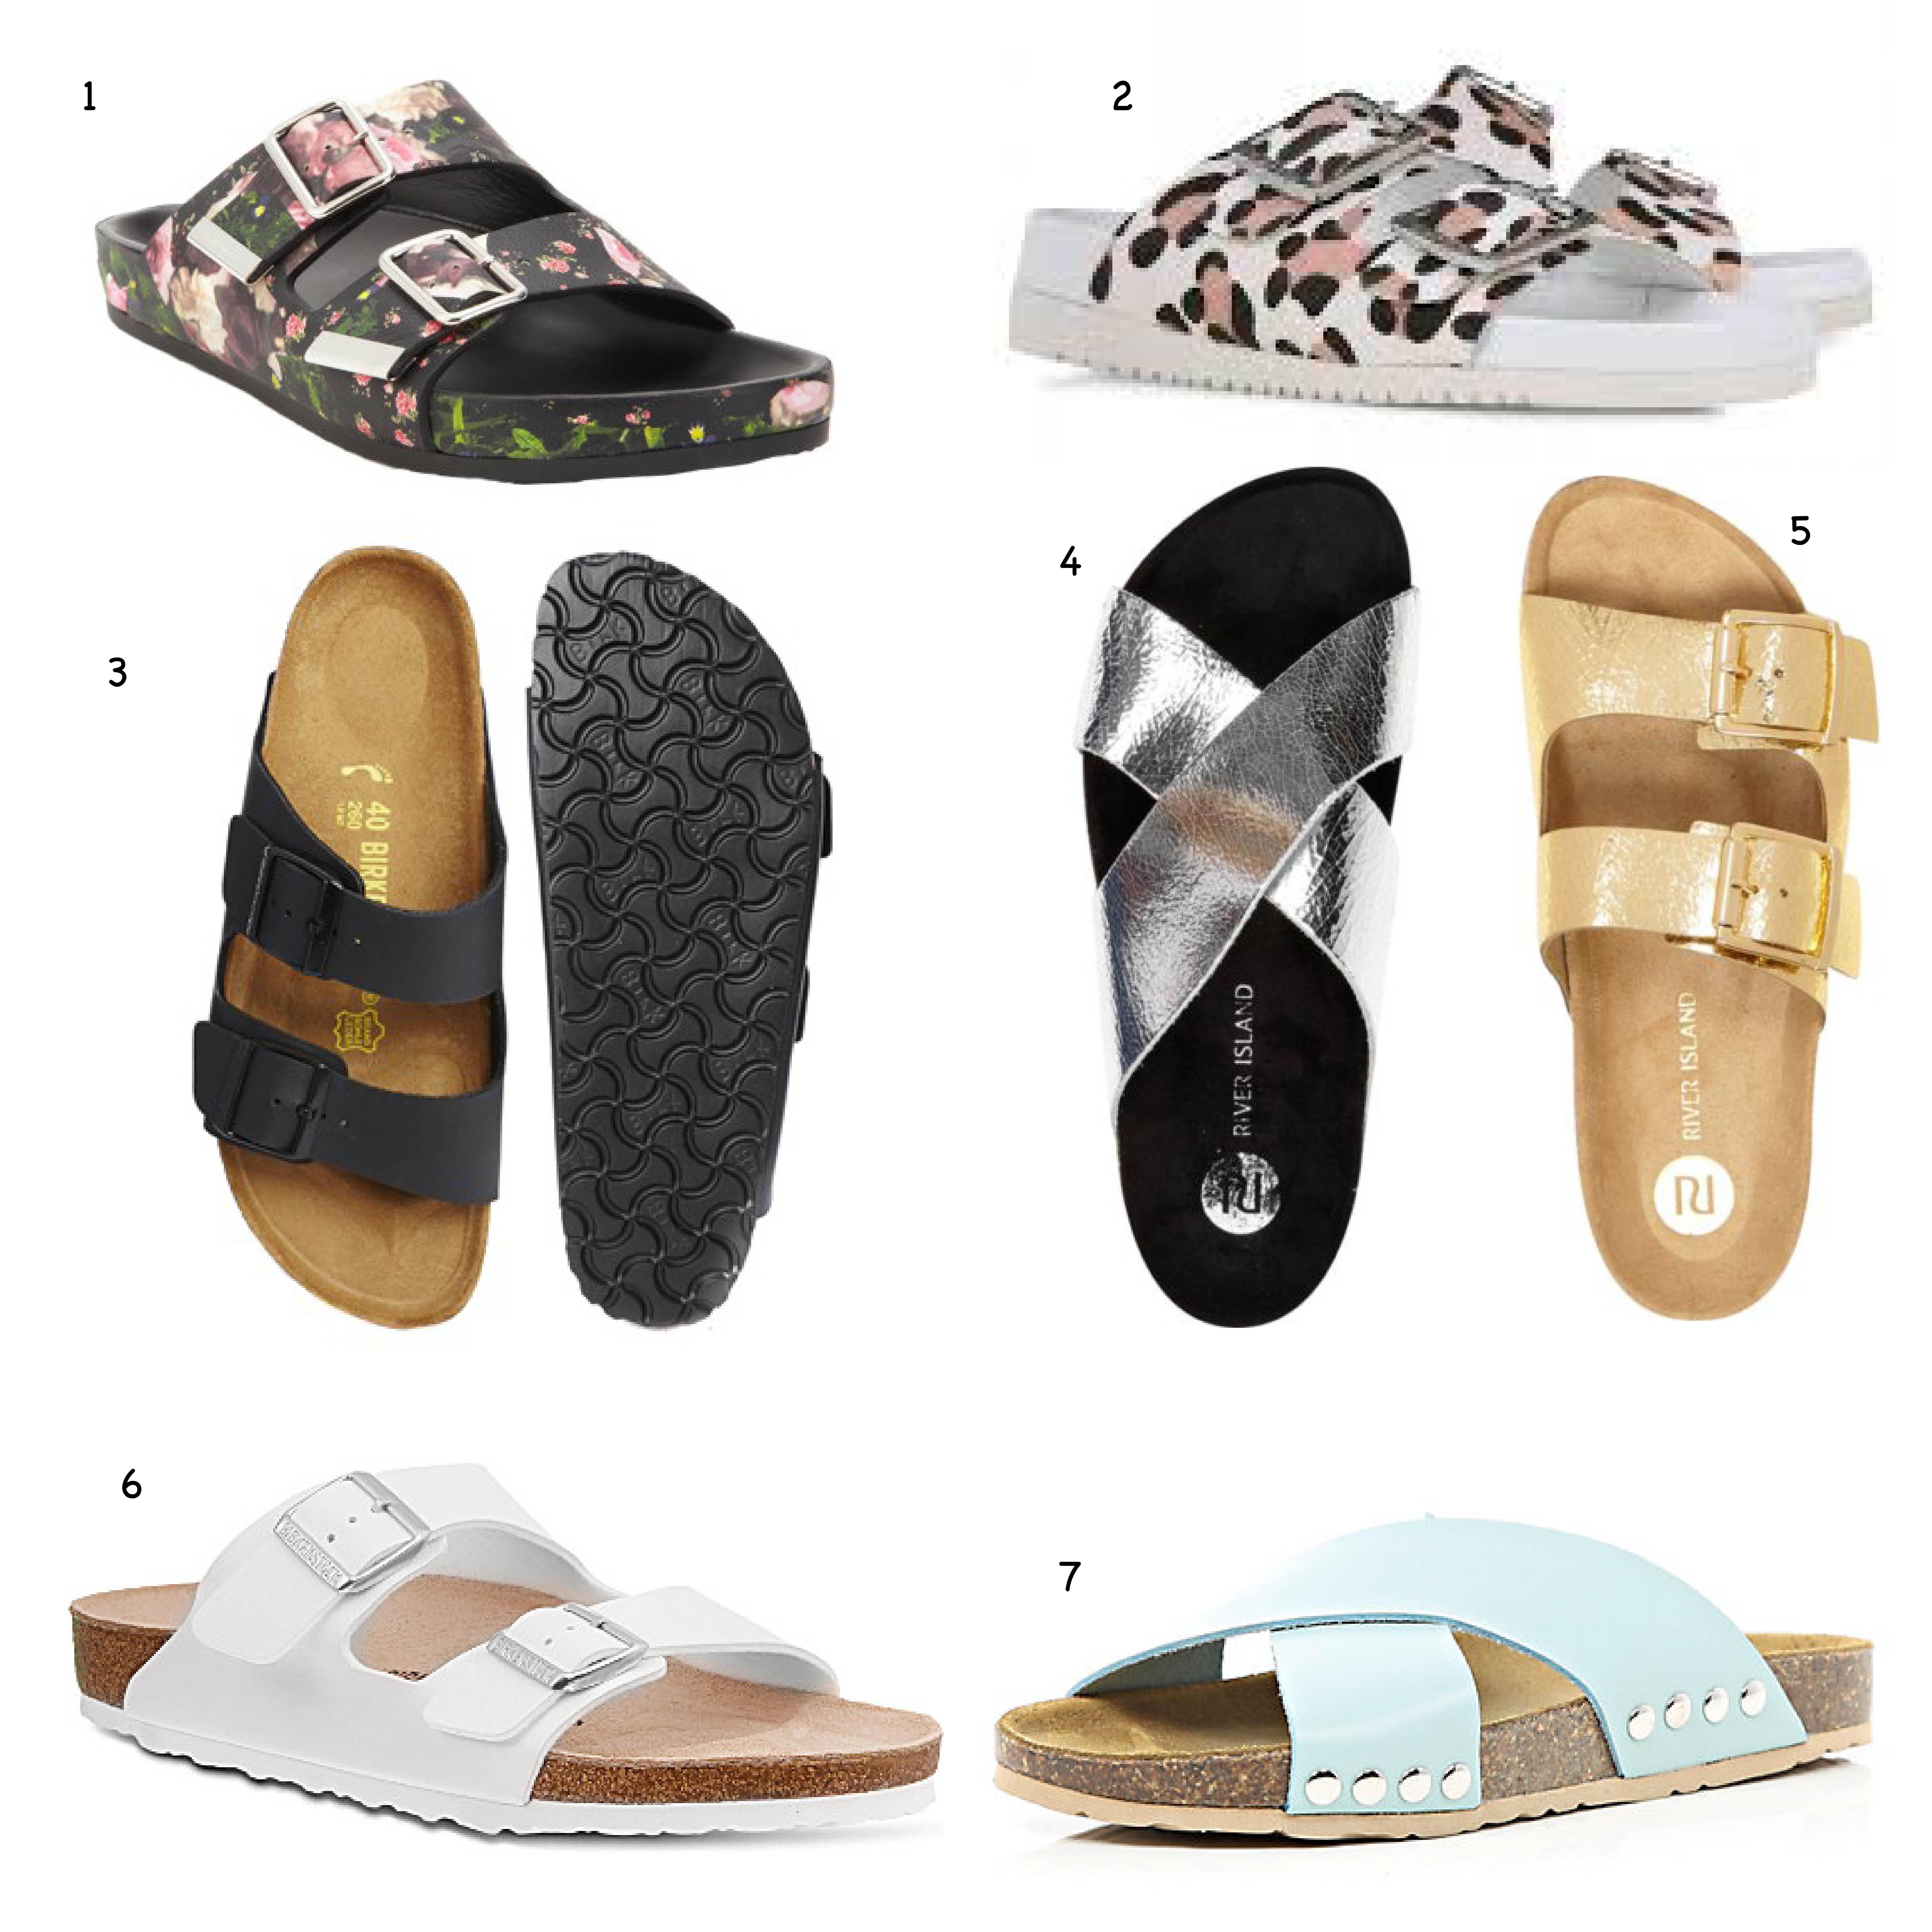 0e7f4299a6d Birkenstock Style Sandals